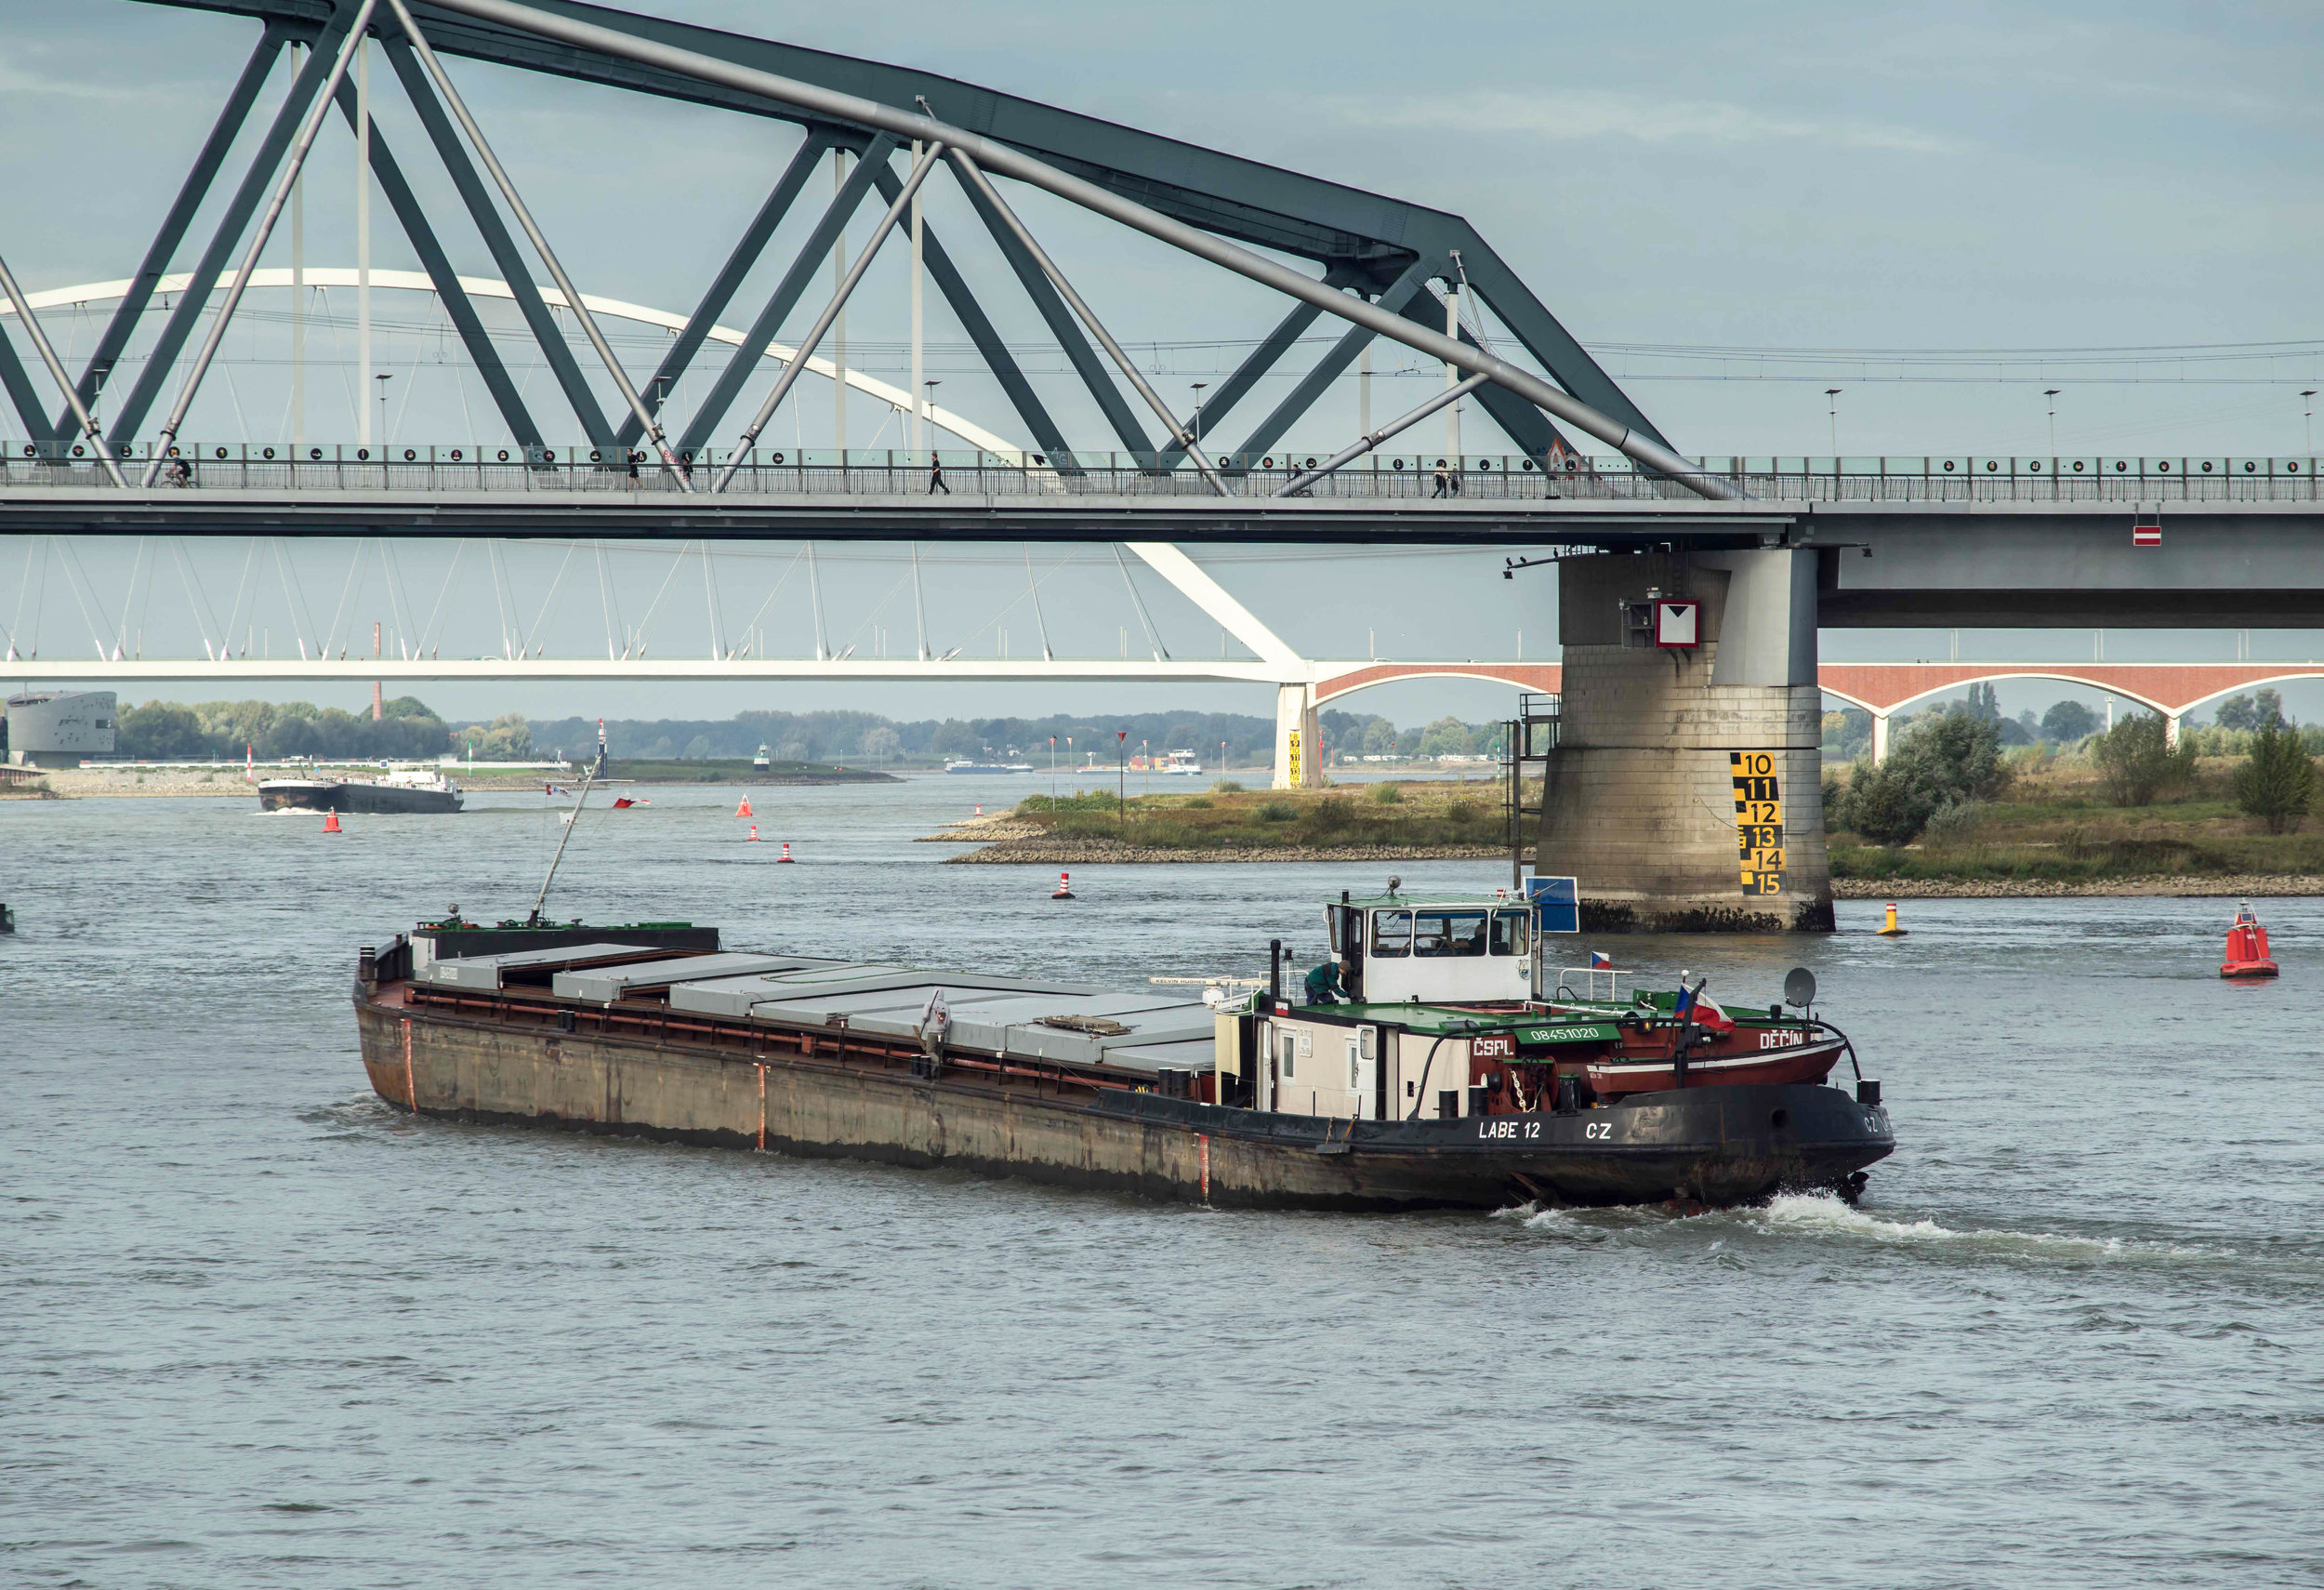 Nederland 10-01-2017 Dev LR-54.jpg